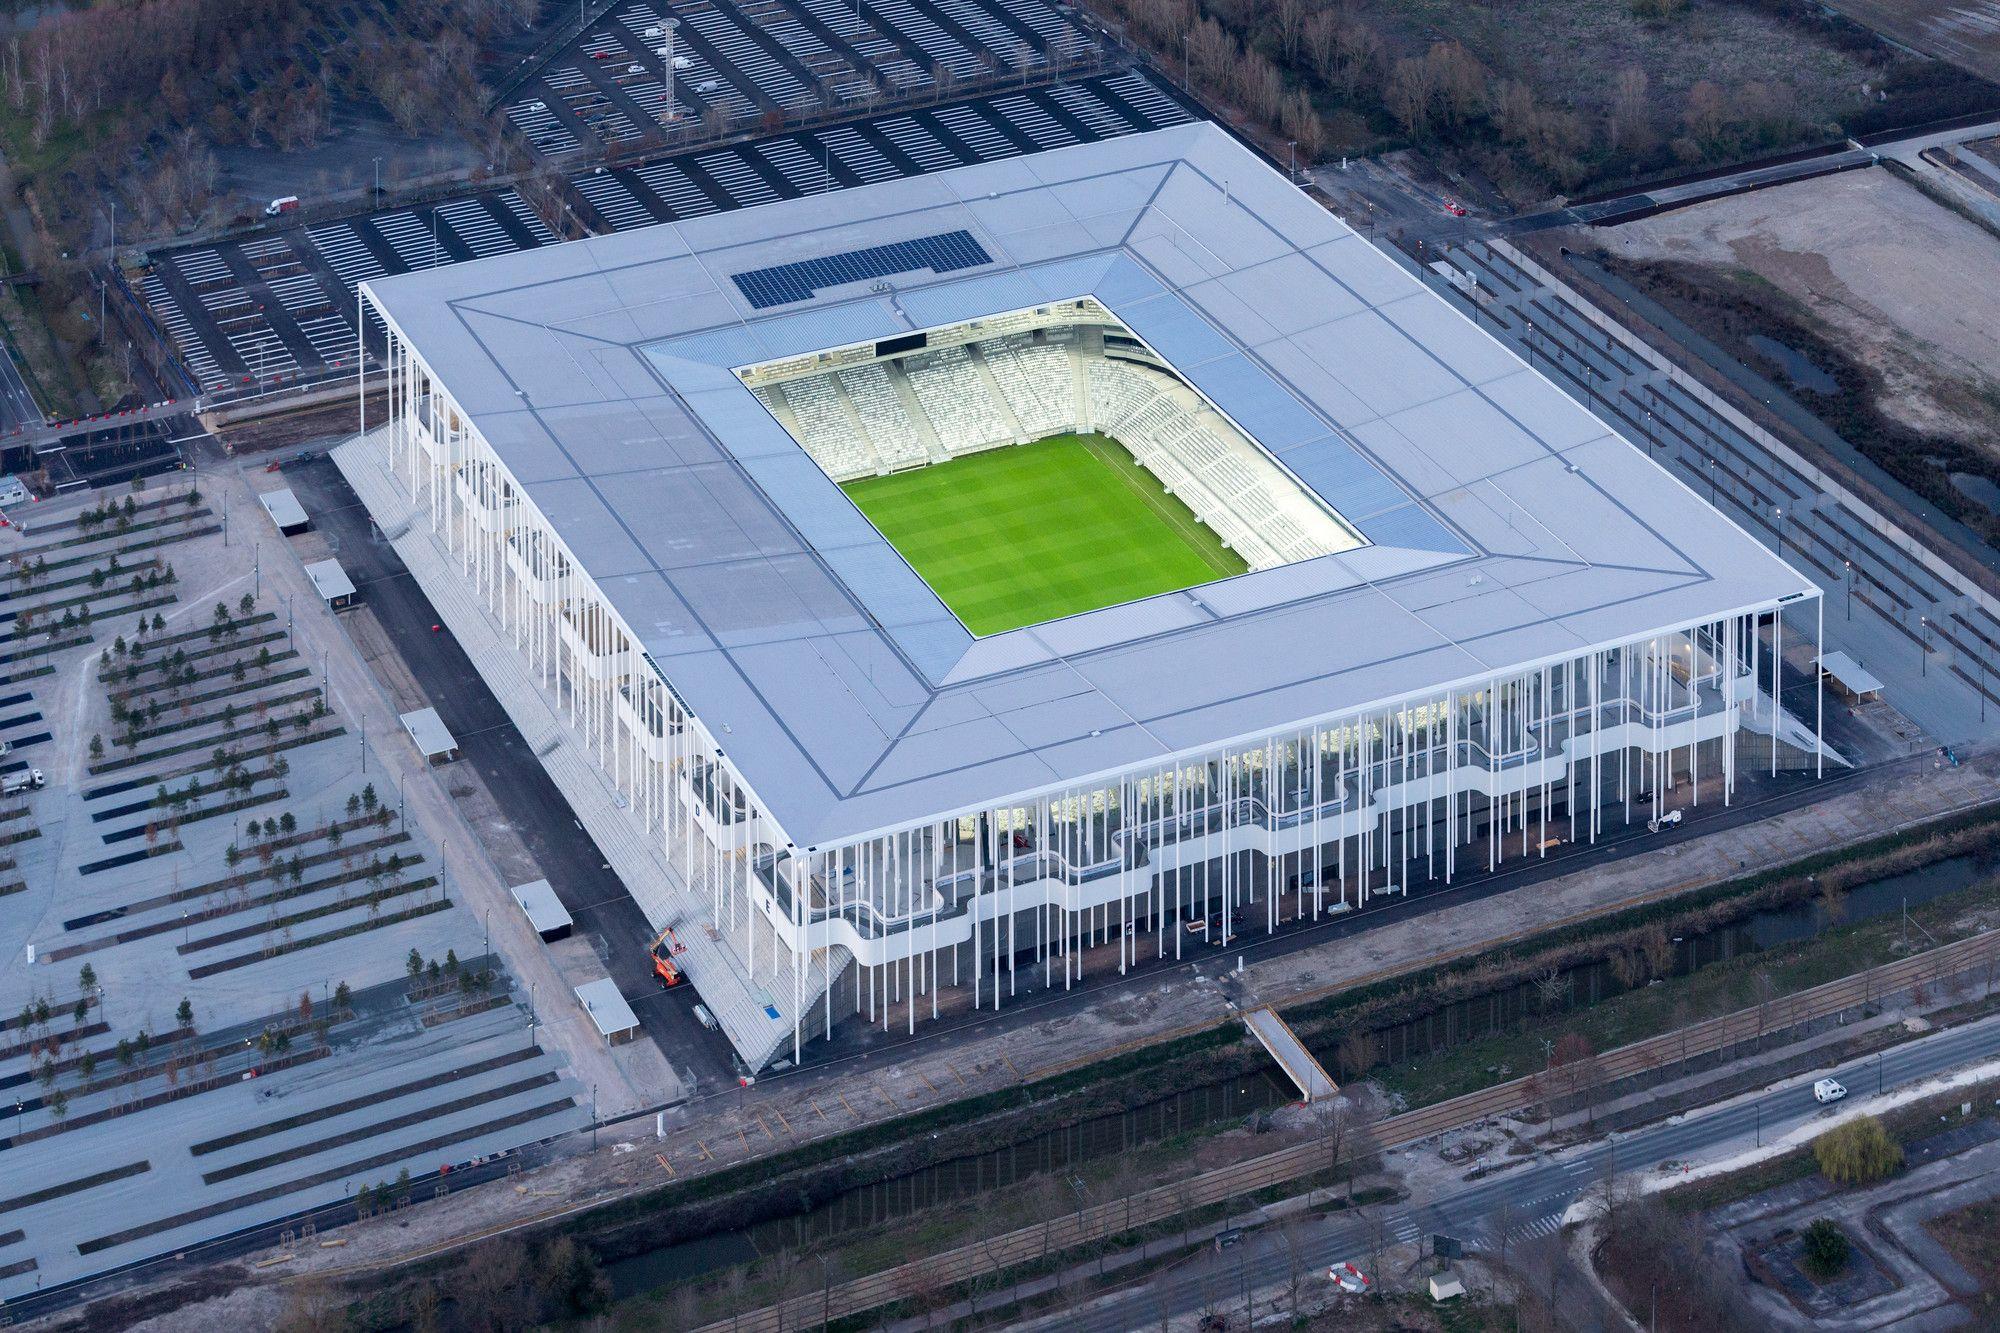 Gallery Of Matmut Atlantique Stadium Herzog De Meuron